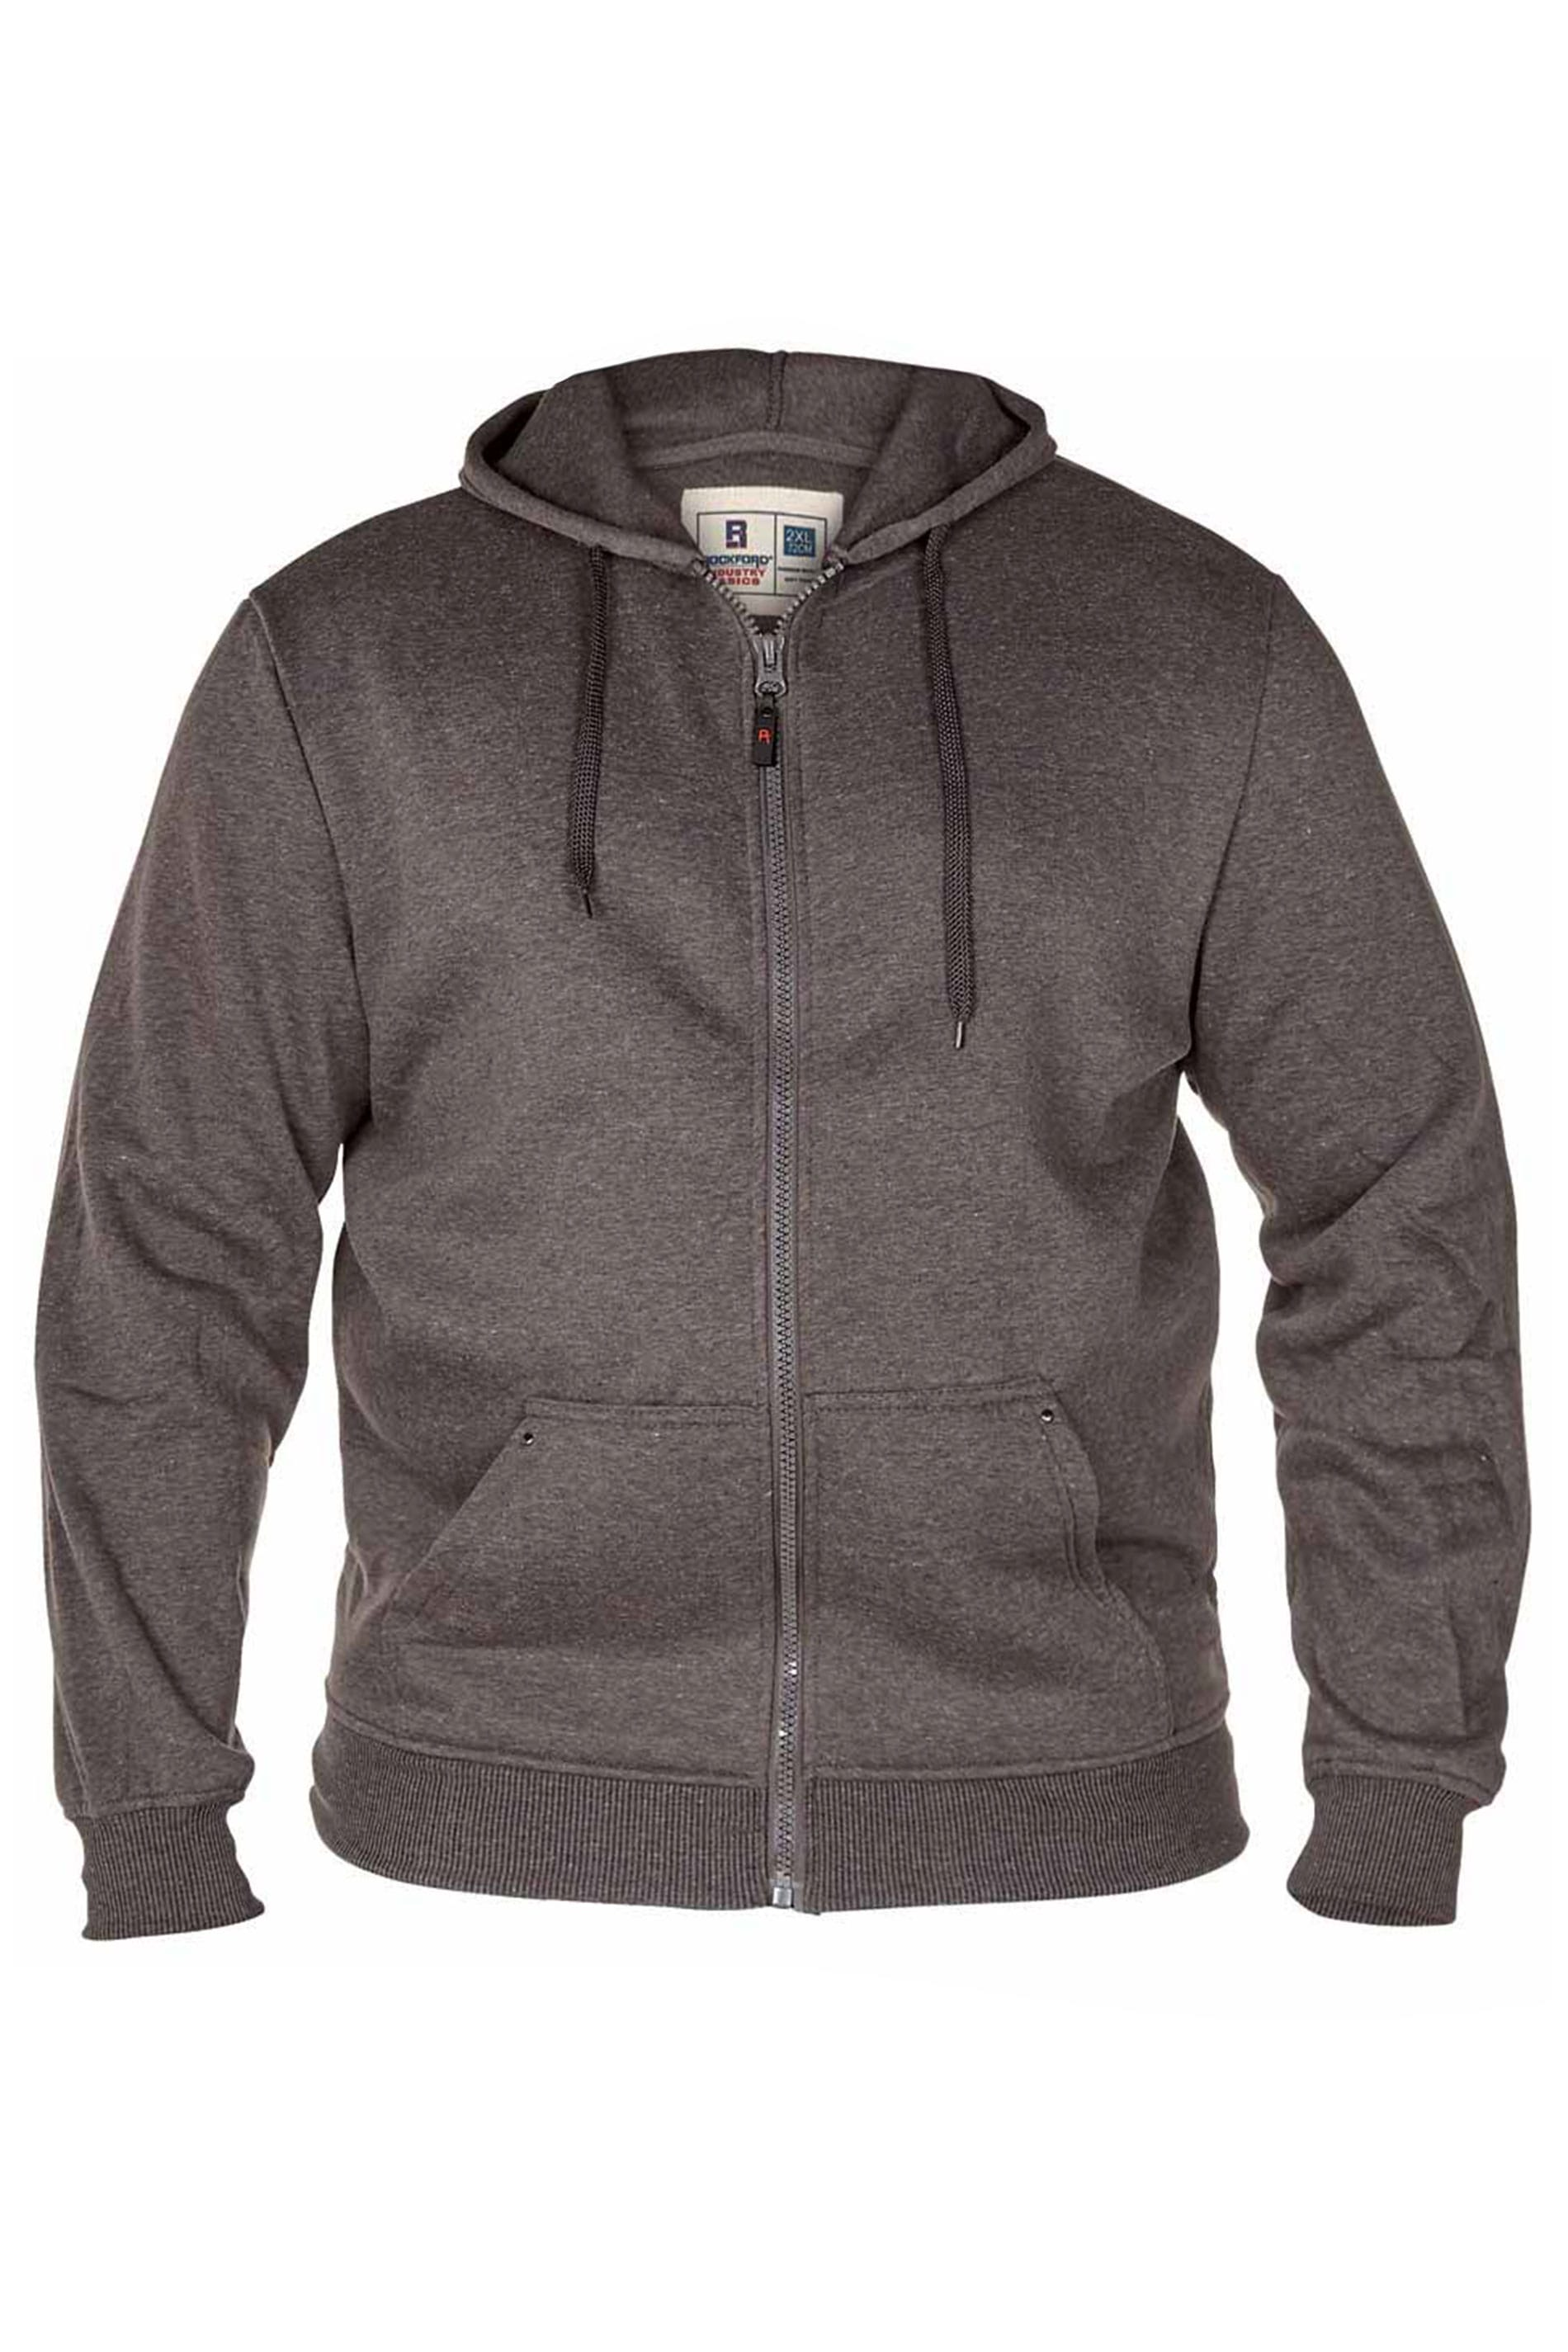 D555 Rockford Grey Cantor Zip Through Hoodie